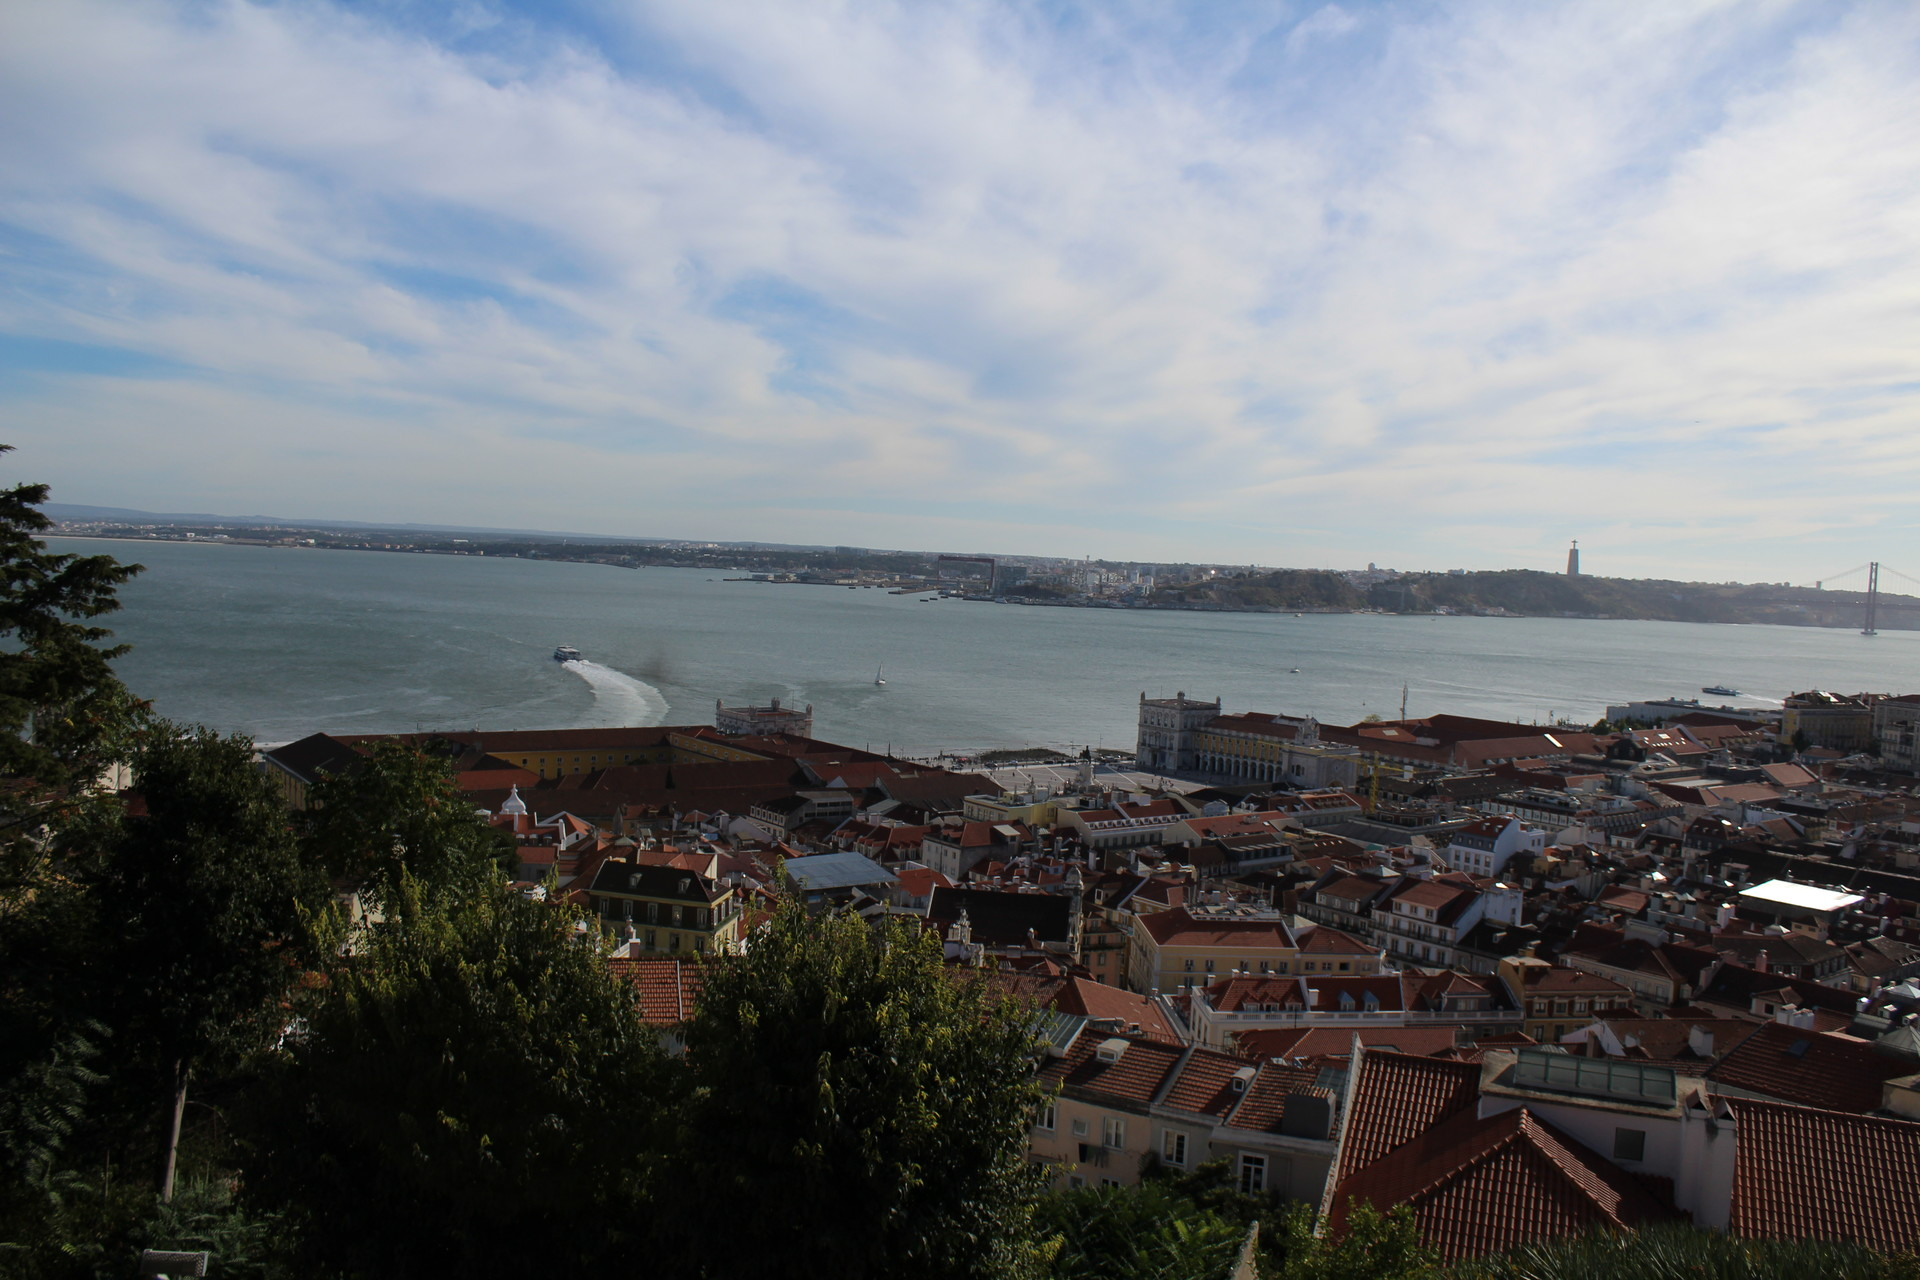 an-historic-place-best-view-b165d6a123df